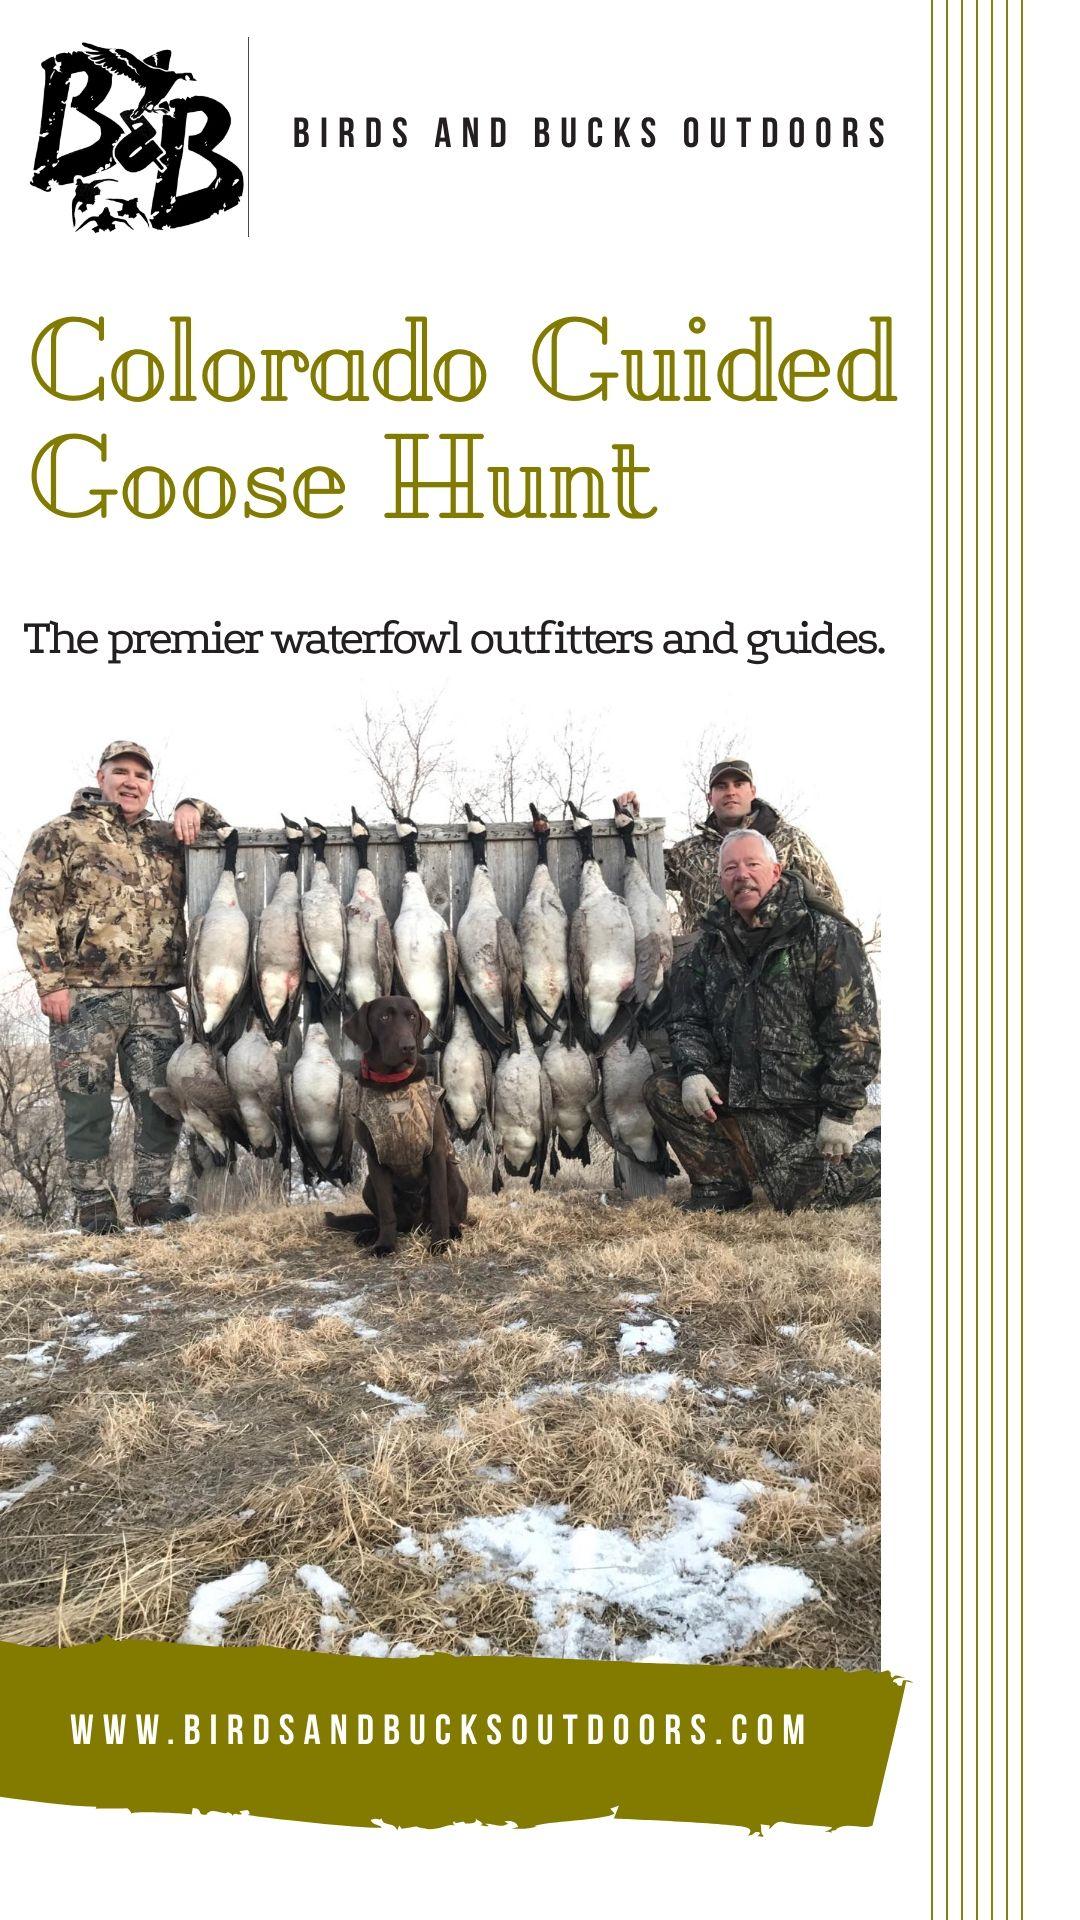 Colorado Goose Hunting Goose hunting, Hunting guide